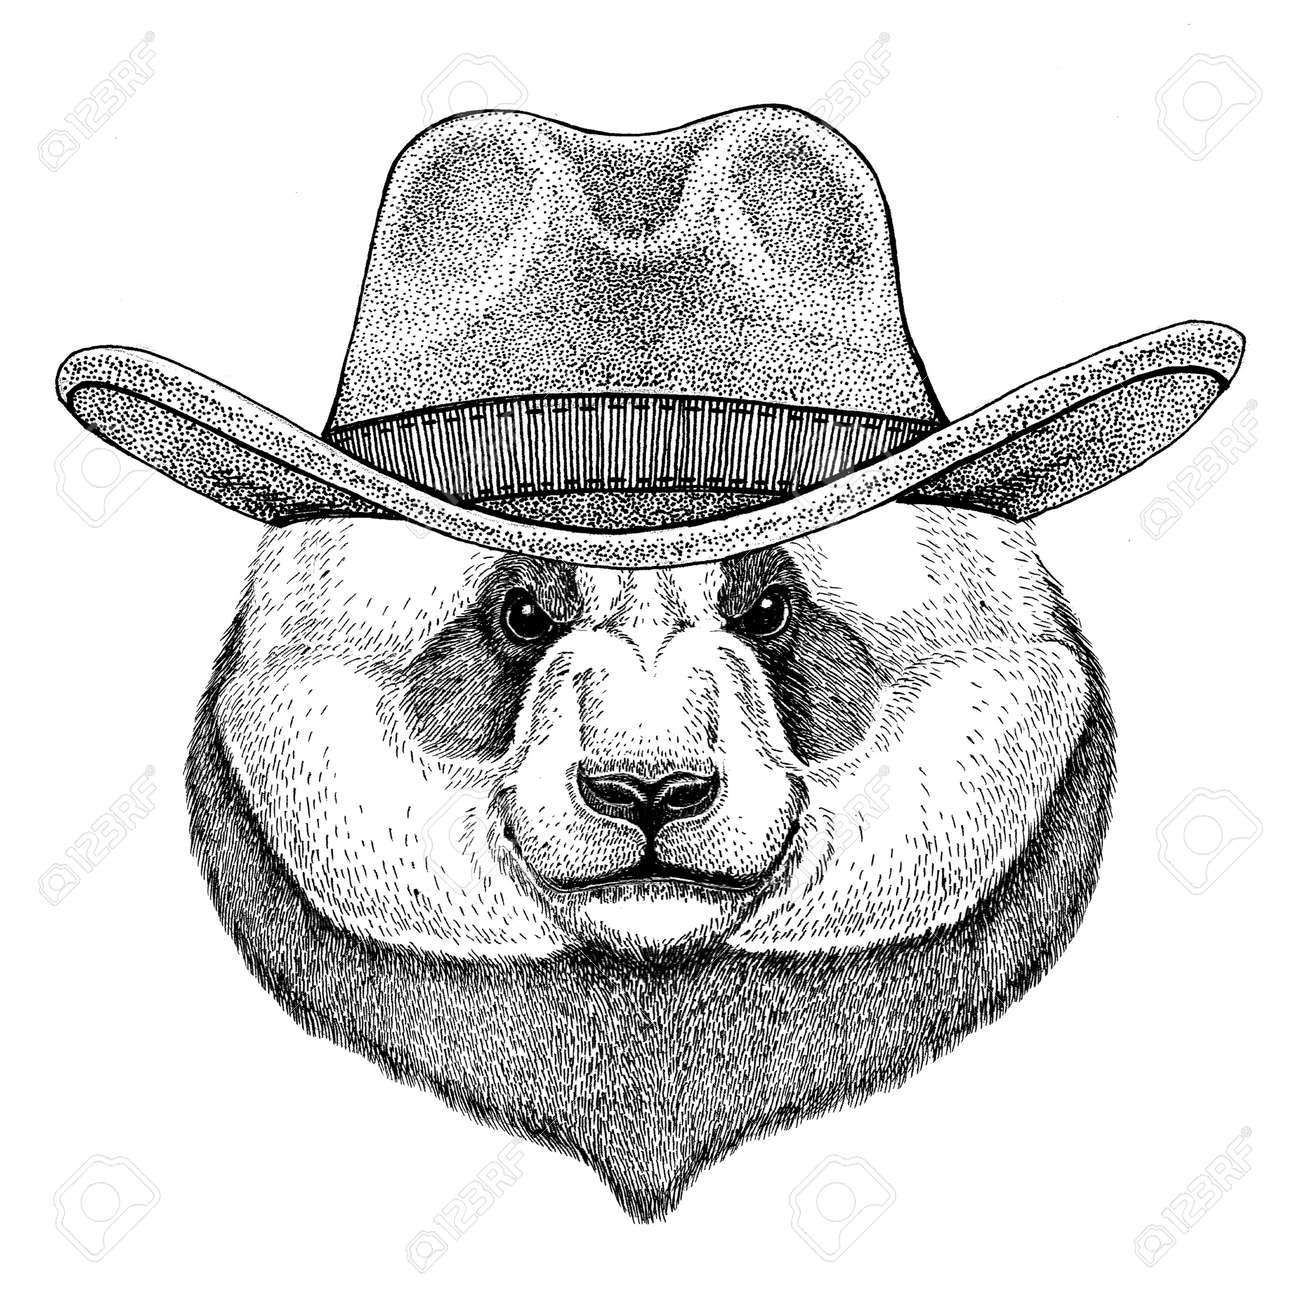 bb49ddc9f31d5b Wild West Cowboy Hats - Latest and Best Hat Models